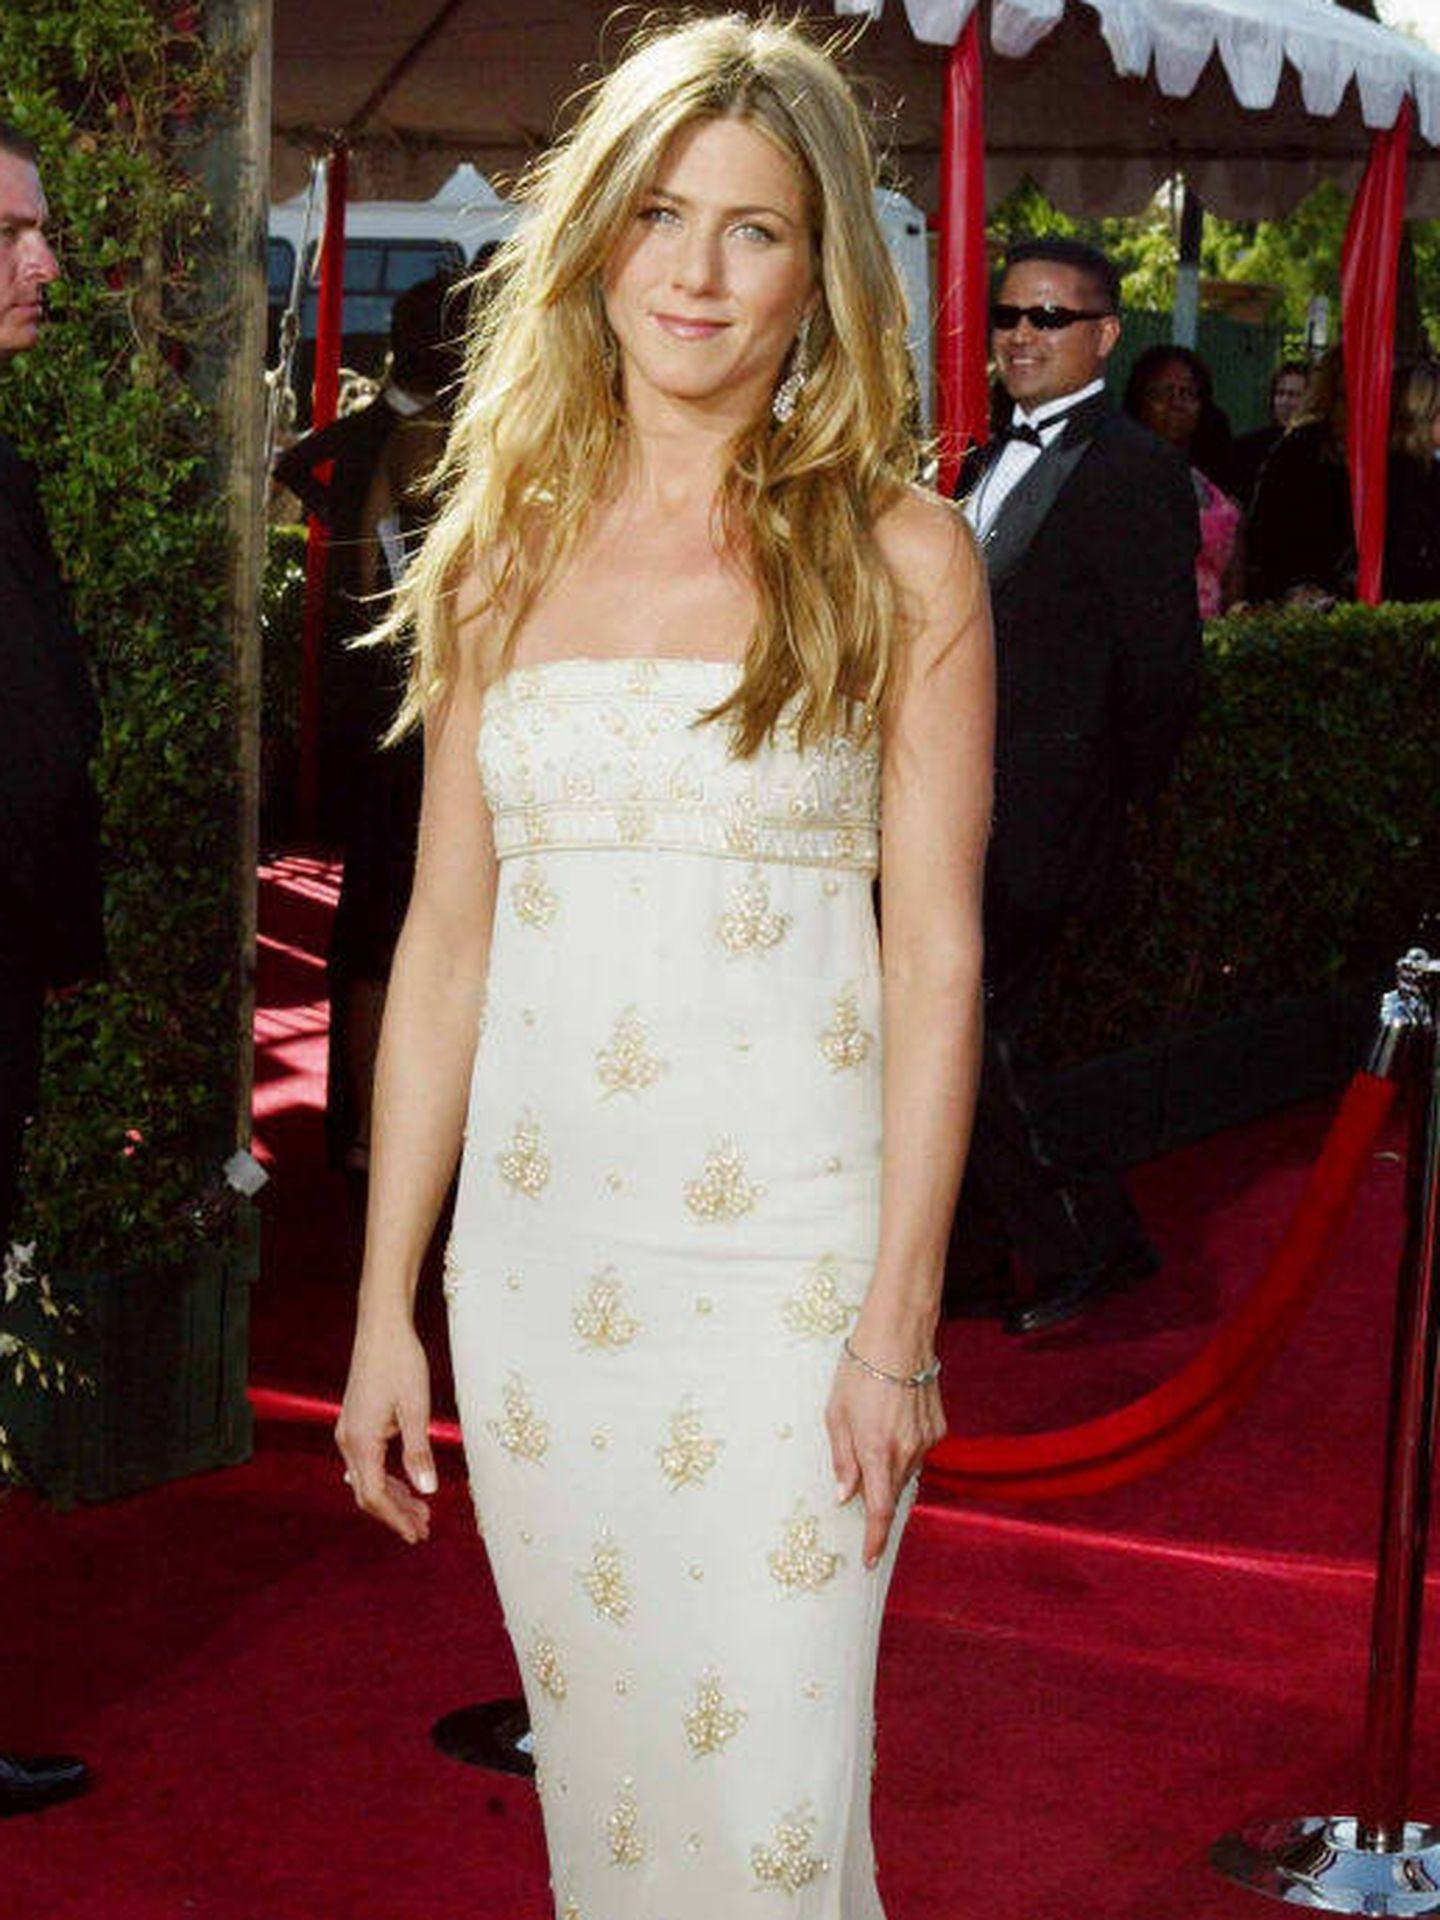 Jennifer Aniston en los Premios Emmy 2004. (Getty Images)